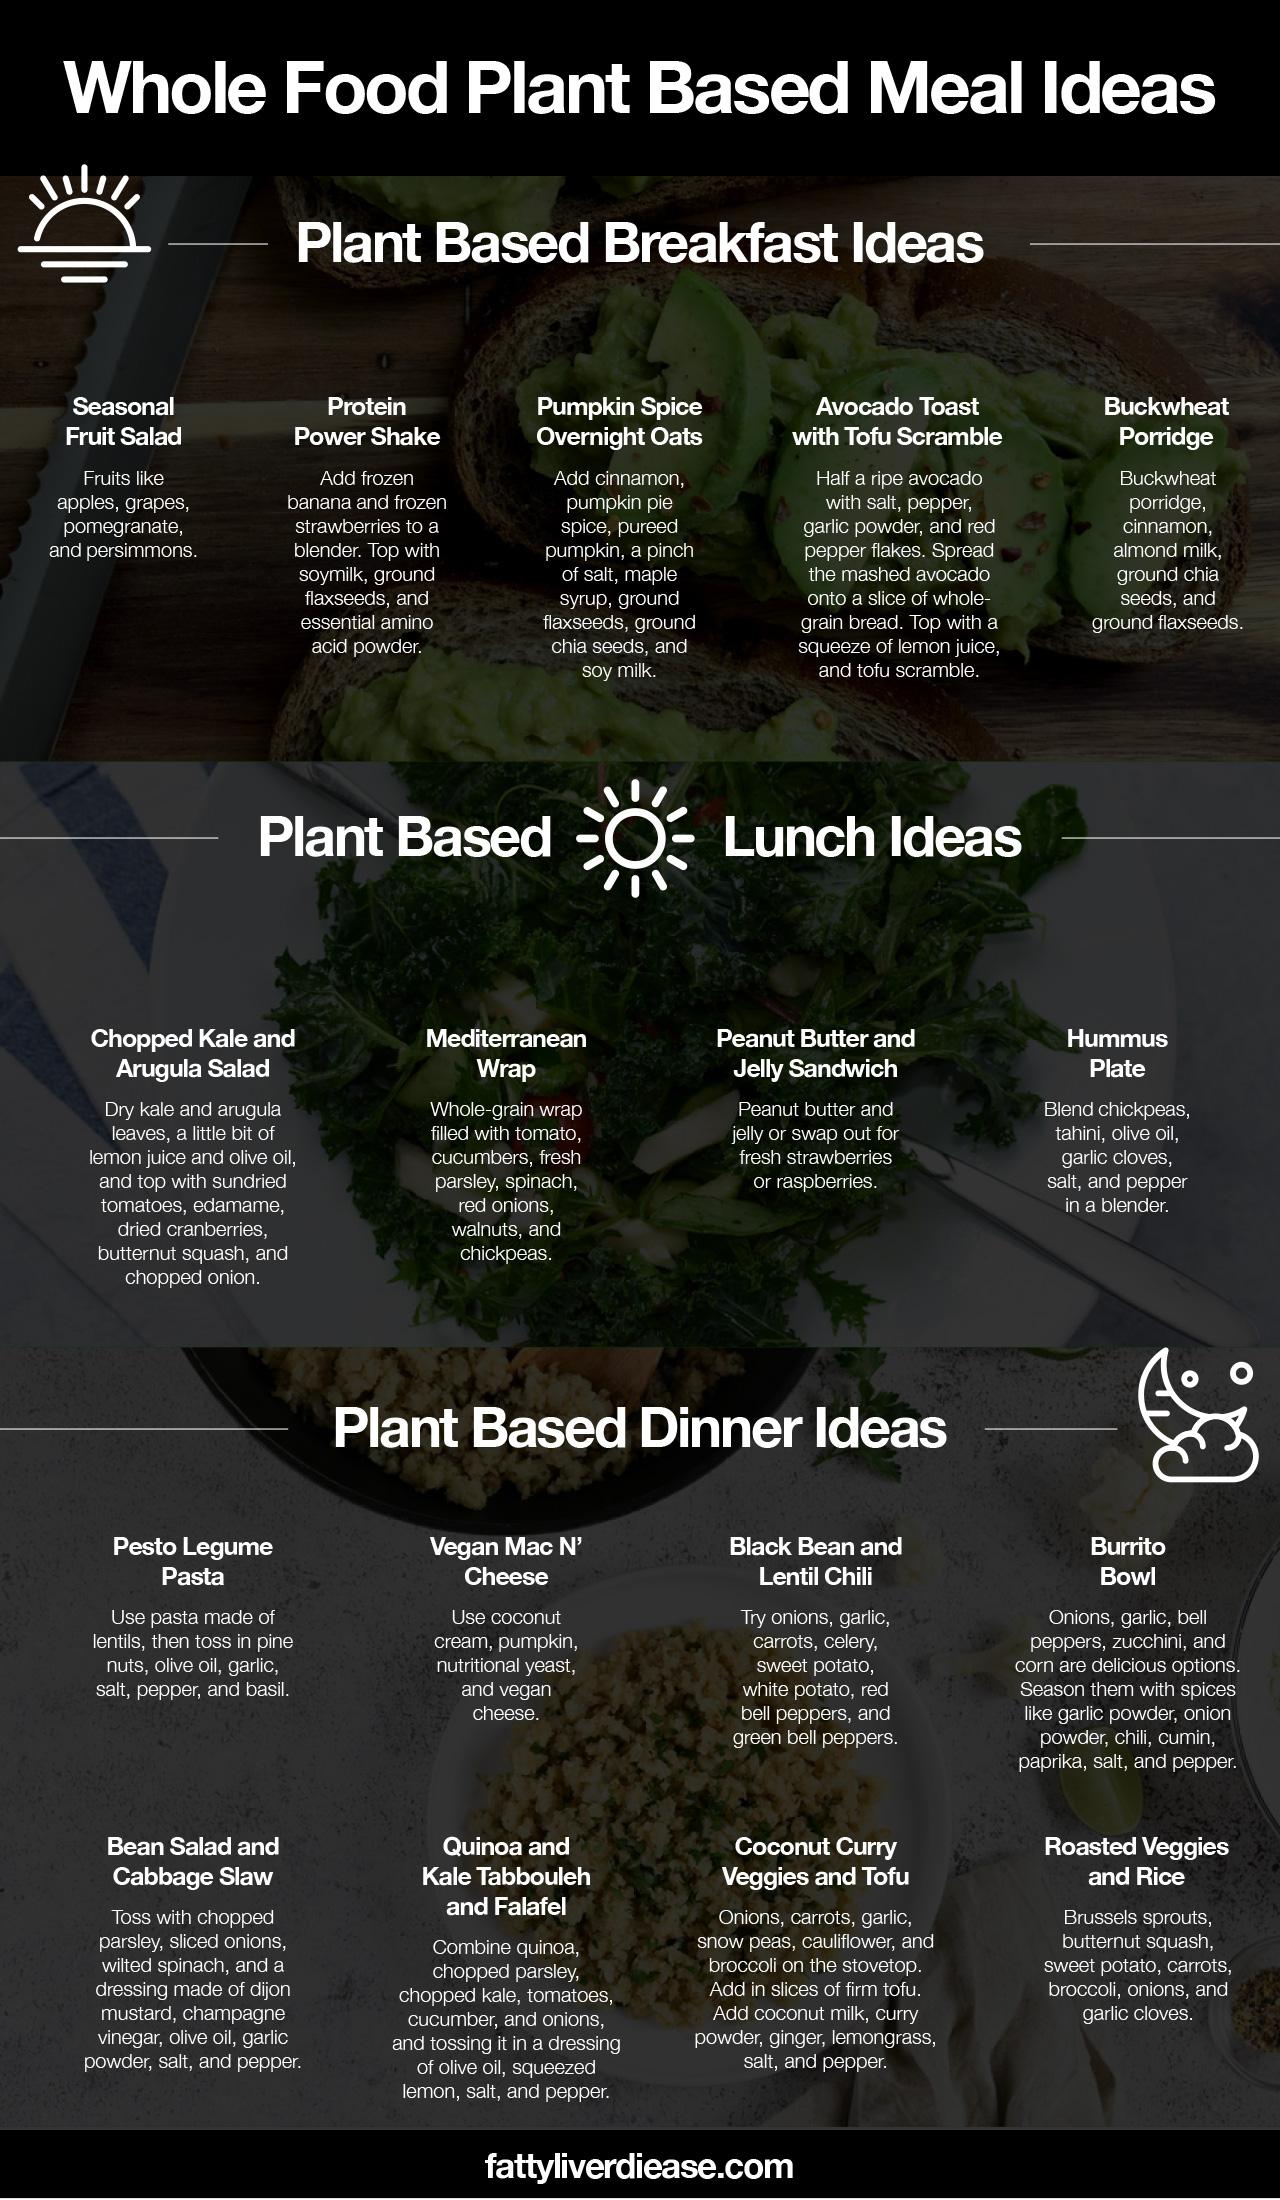 Whole food plant based recipes